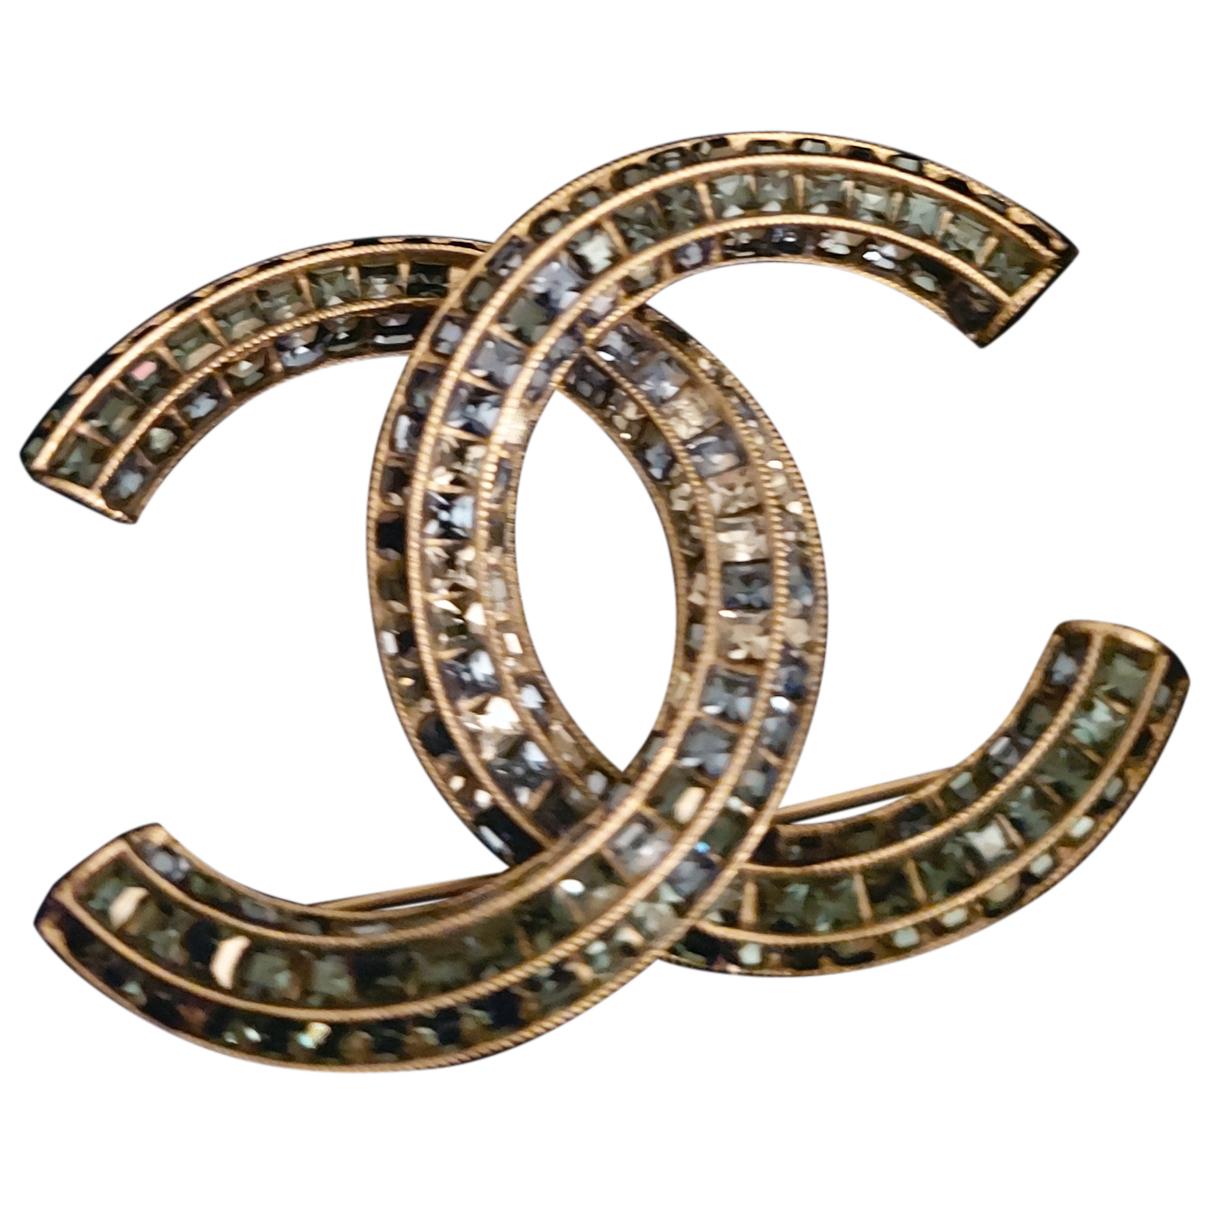 Broche CC en Metal Azul Chanel